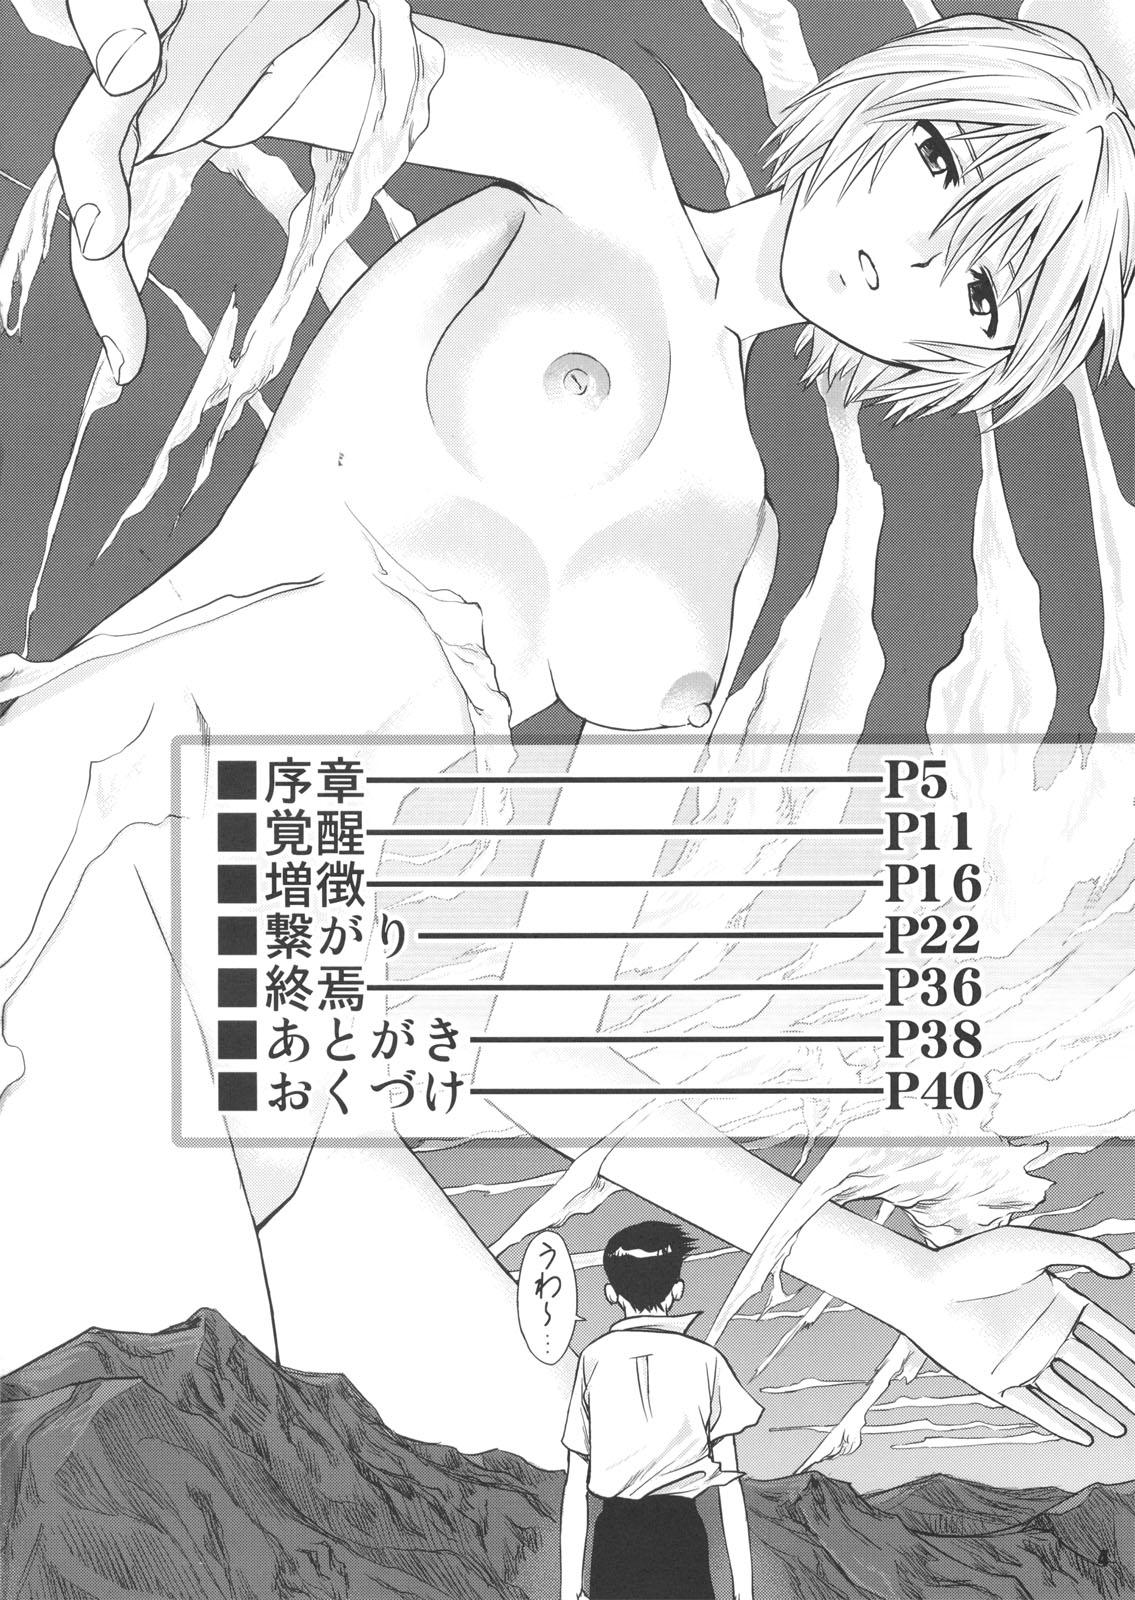 Ayanami no Okage | Thanks to Ayanami... 2